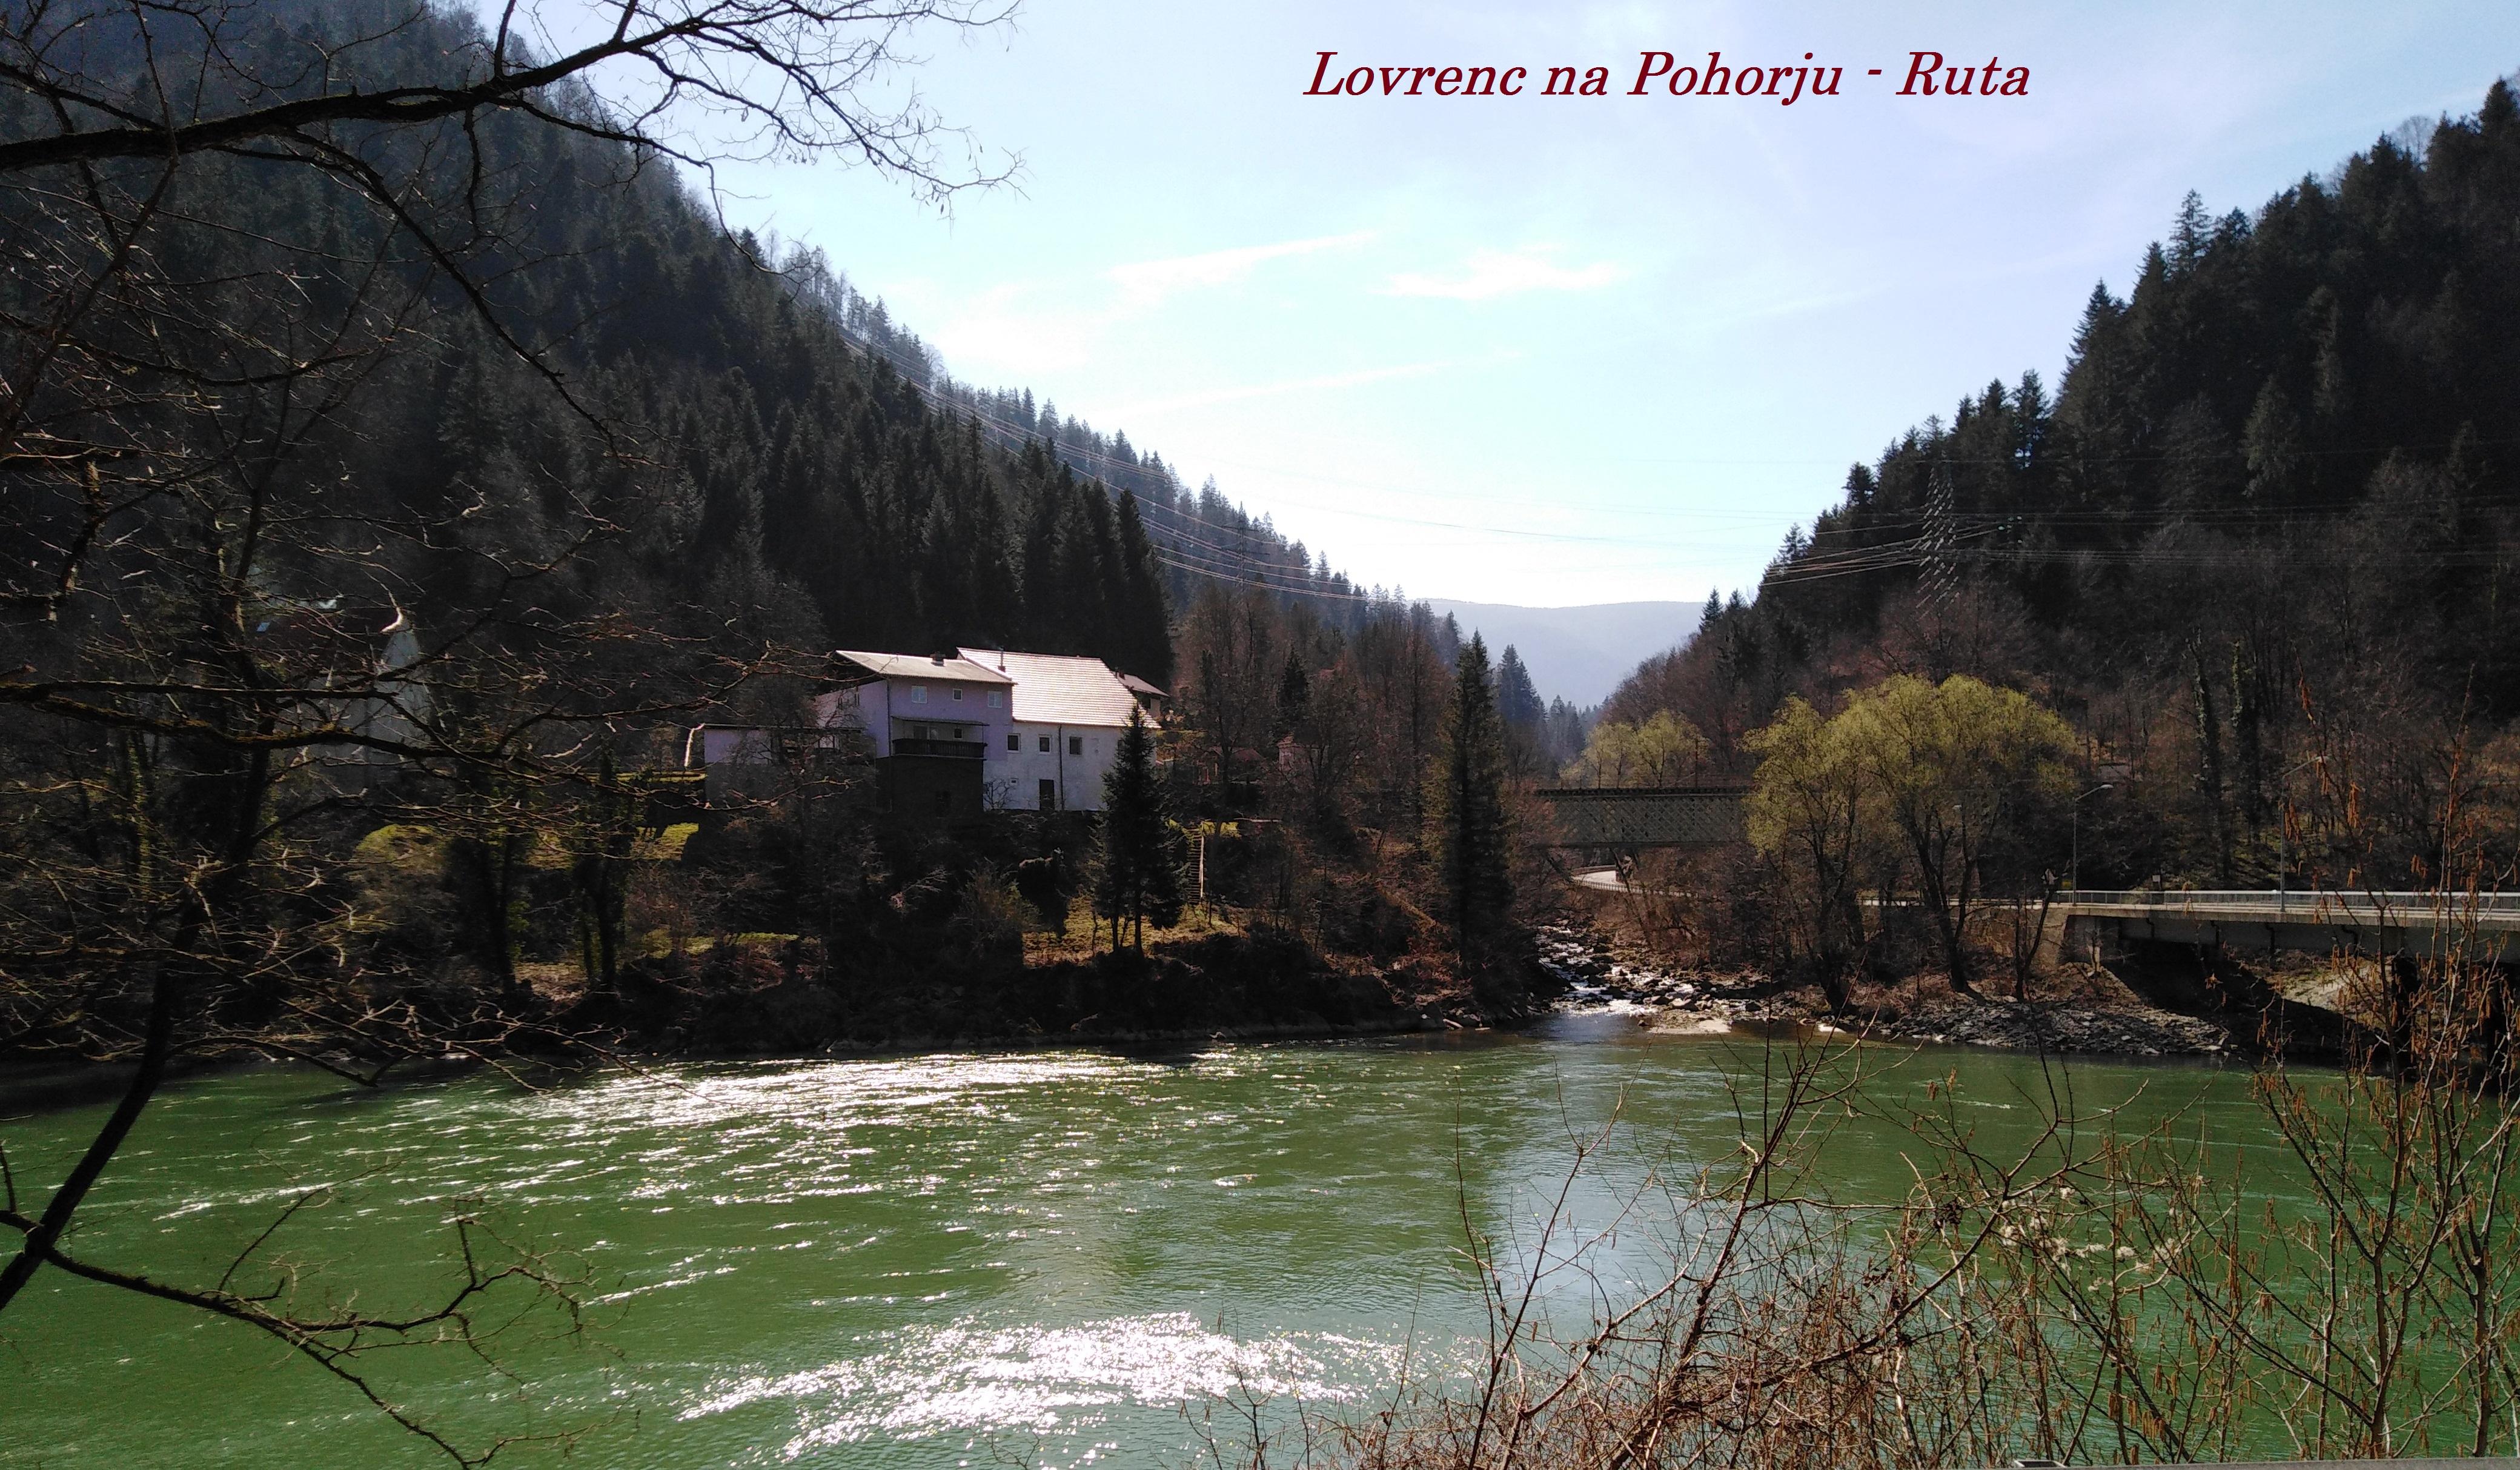 http://shramba.lovrenc.net/maxi/klepet/lovrenc-na-pohorjuruta-2.jpg